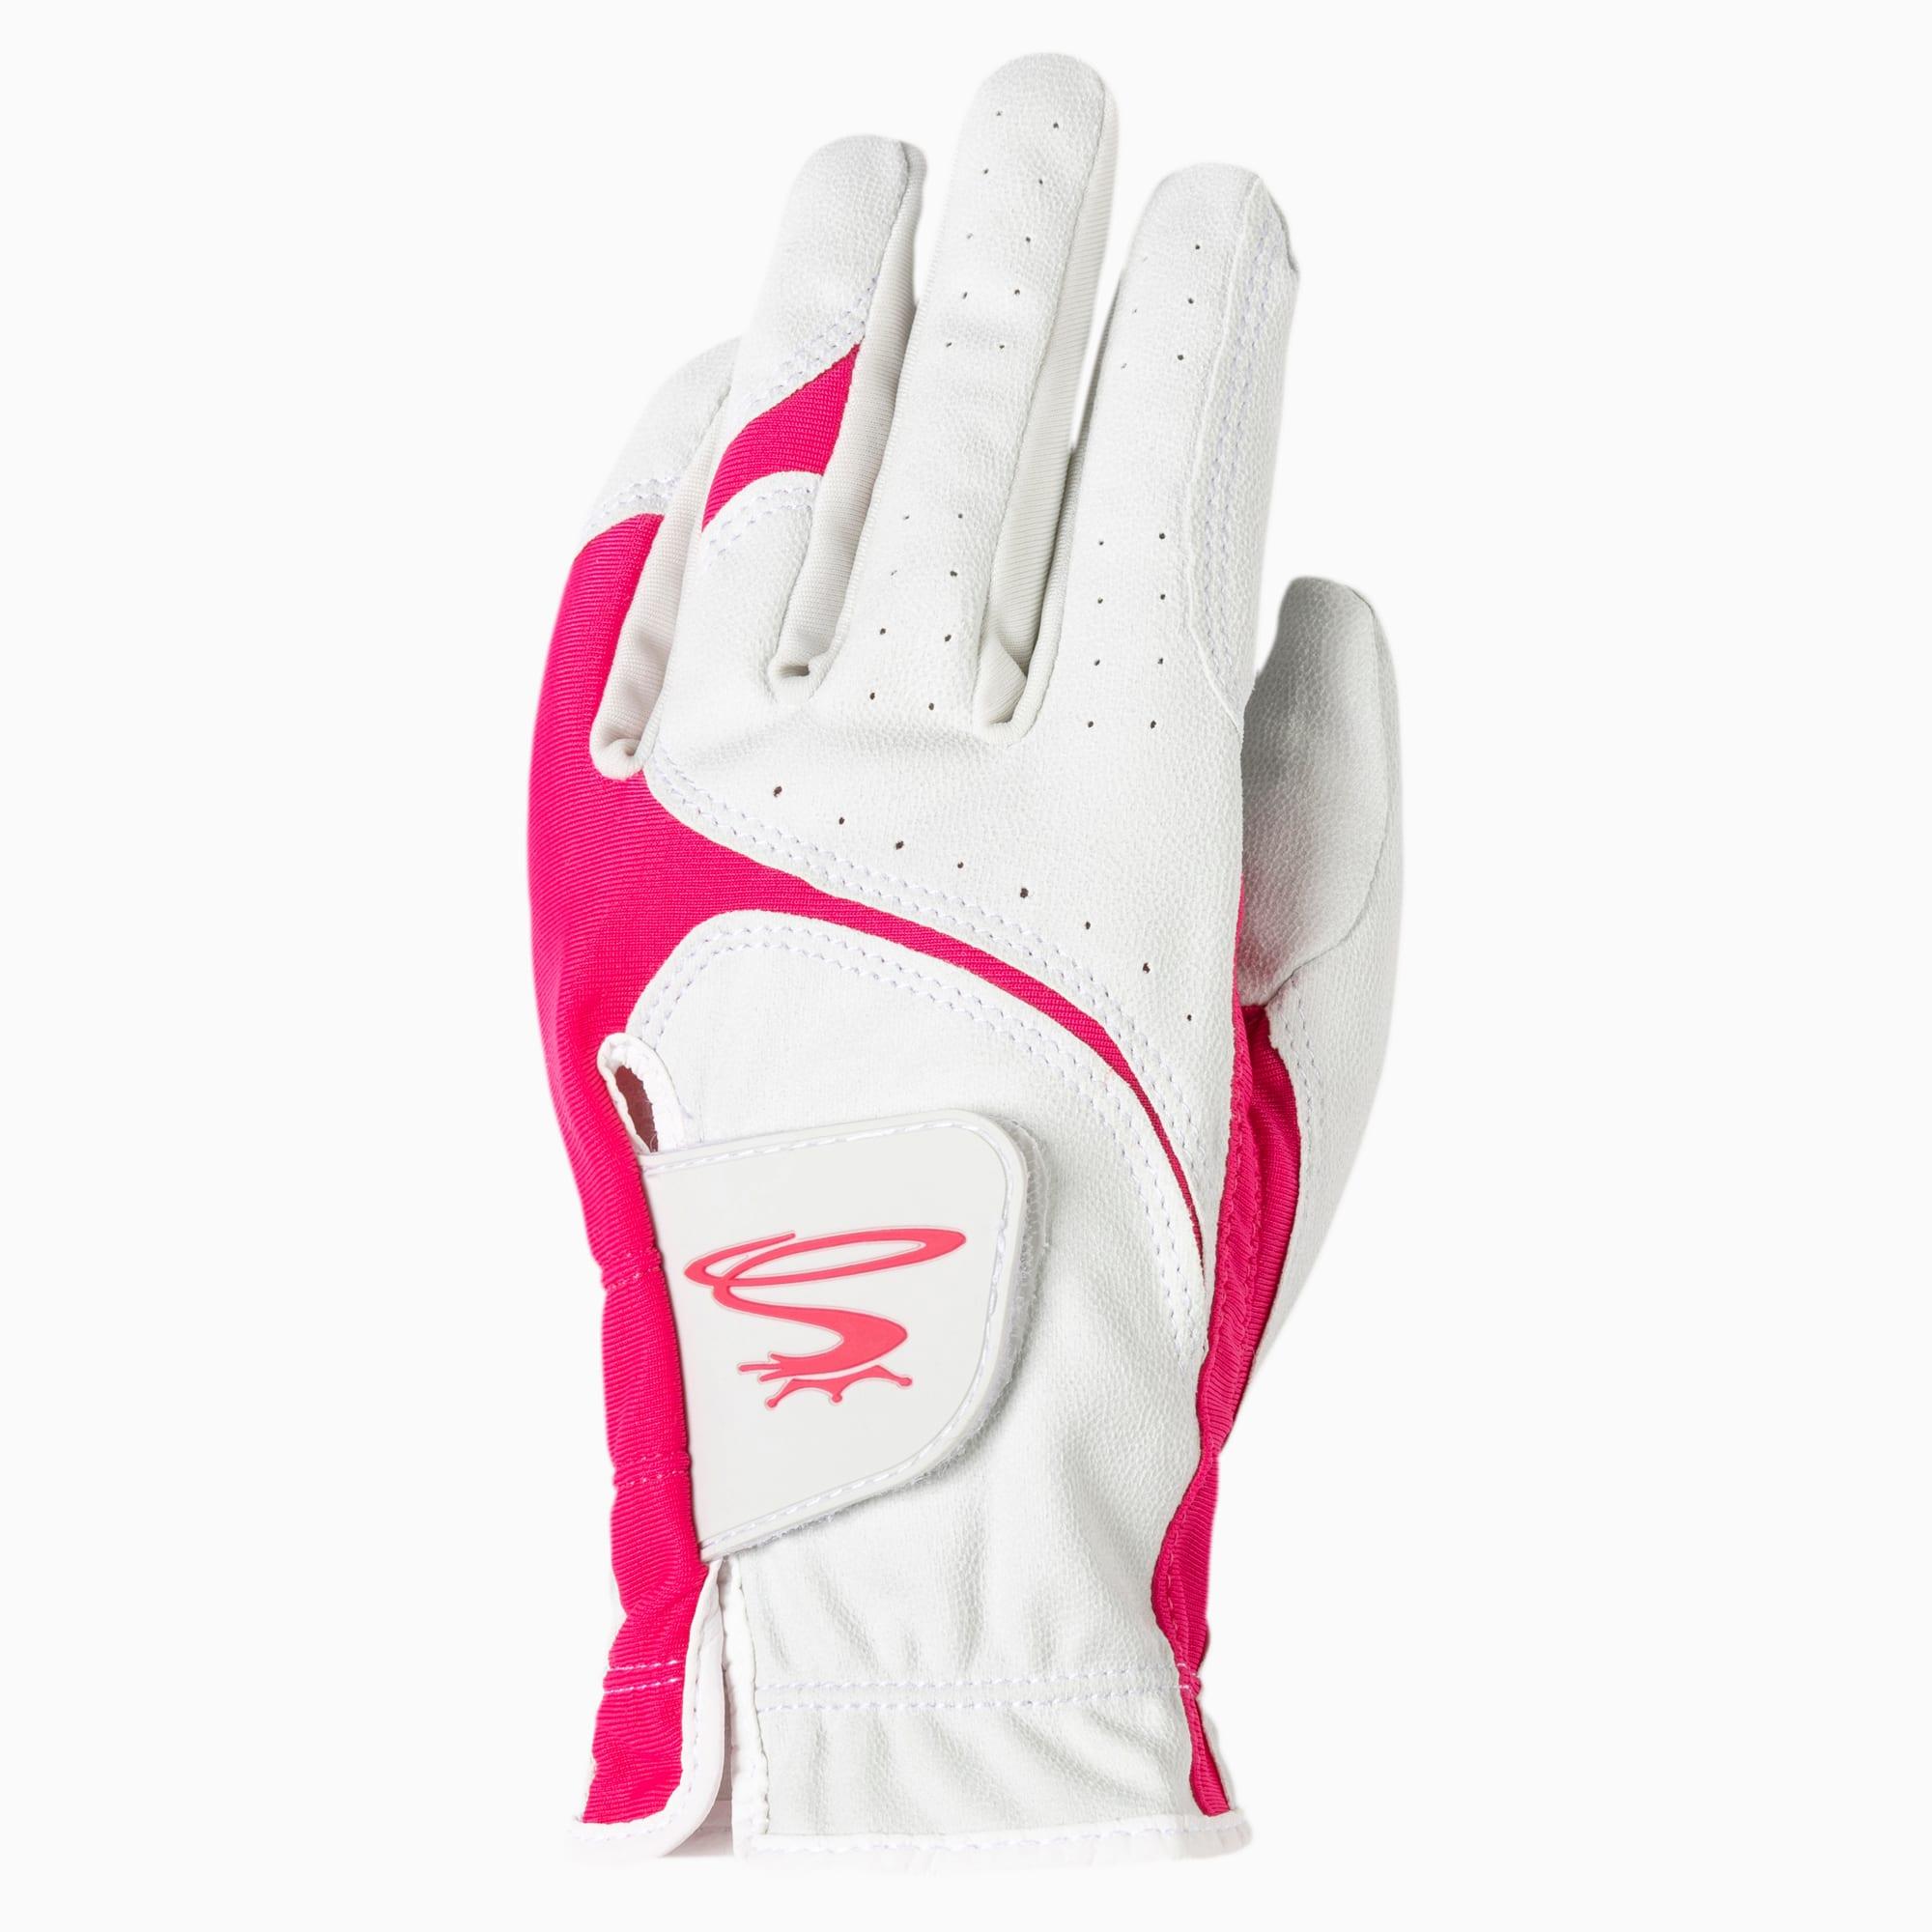 PUMA Gant gauche MicroGrip Flex Golf pour Femme, Blanc, Taille XL, Accessoires